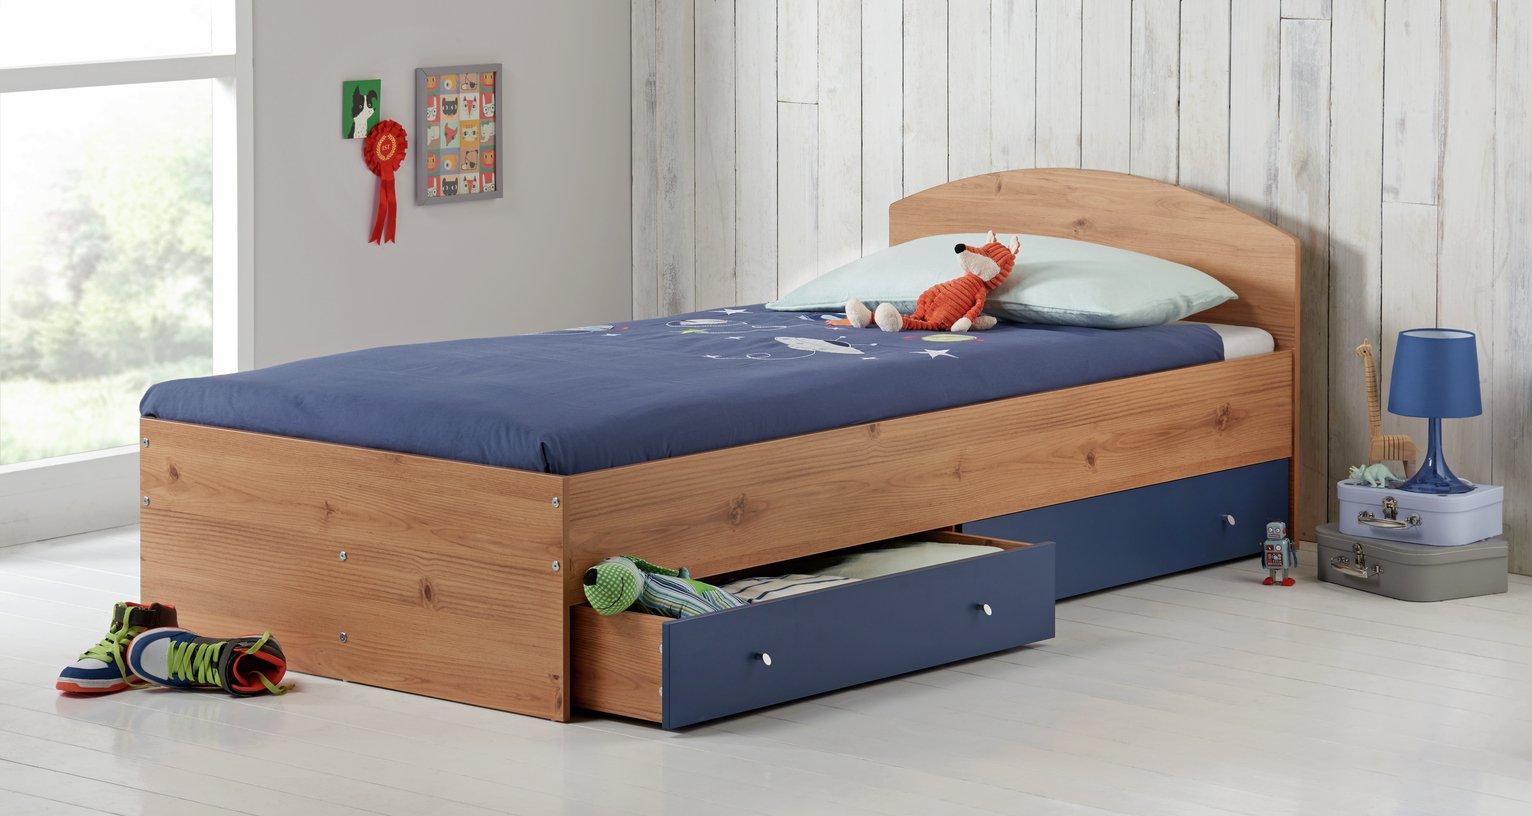 HOME Malibu Single Bed with Elliott Mattress - Pine & Blue.